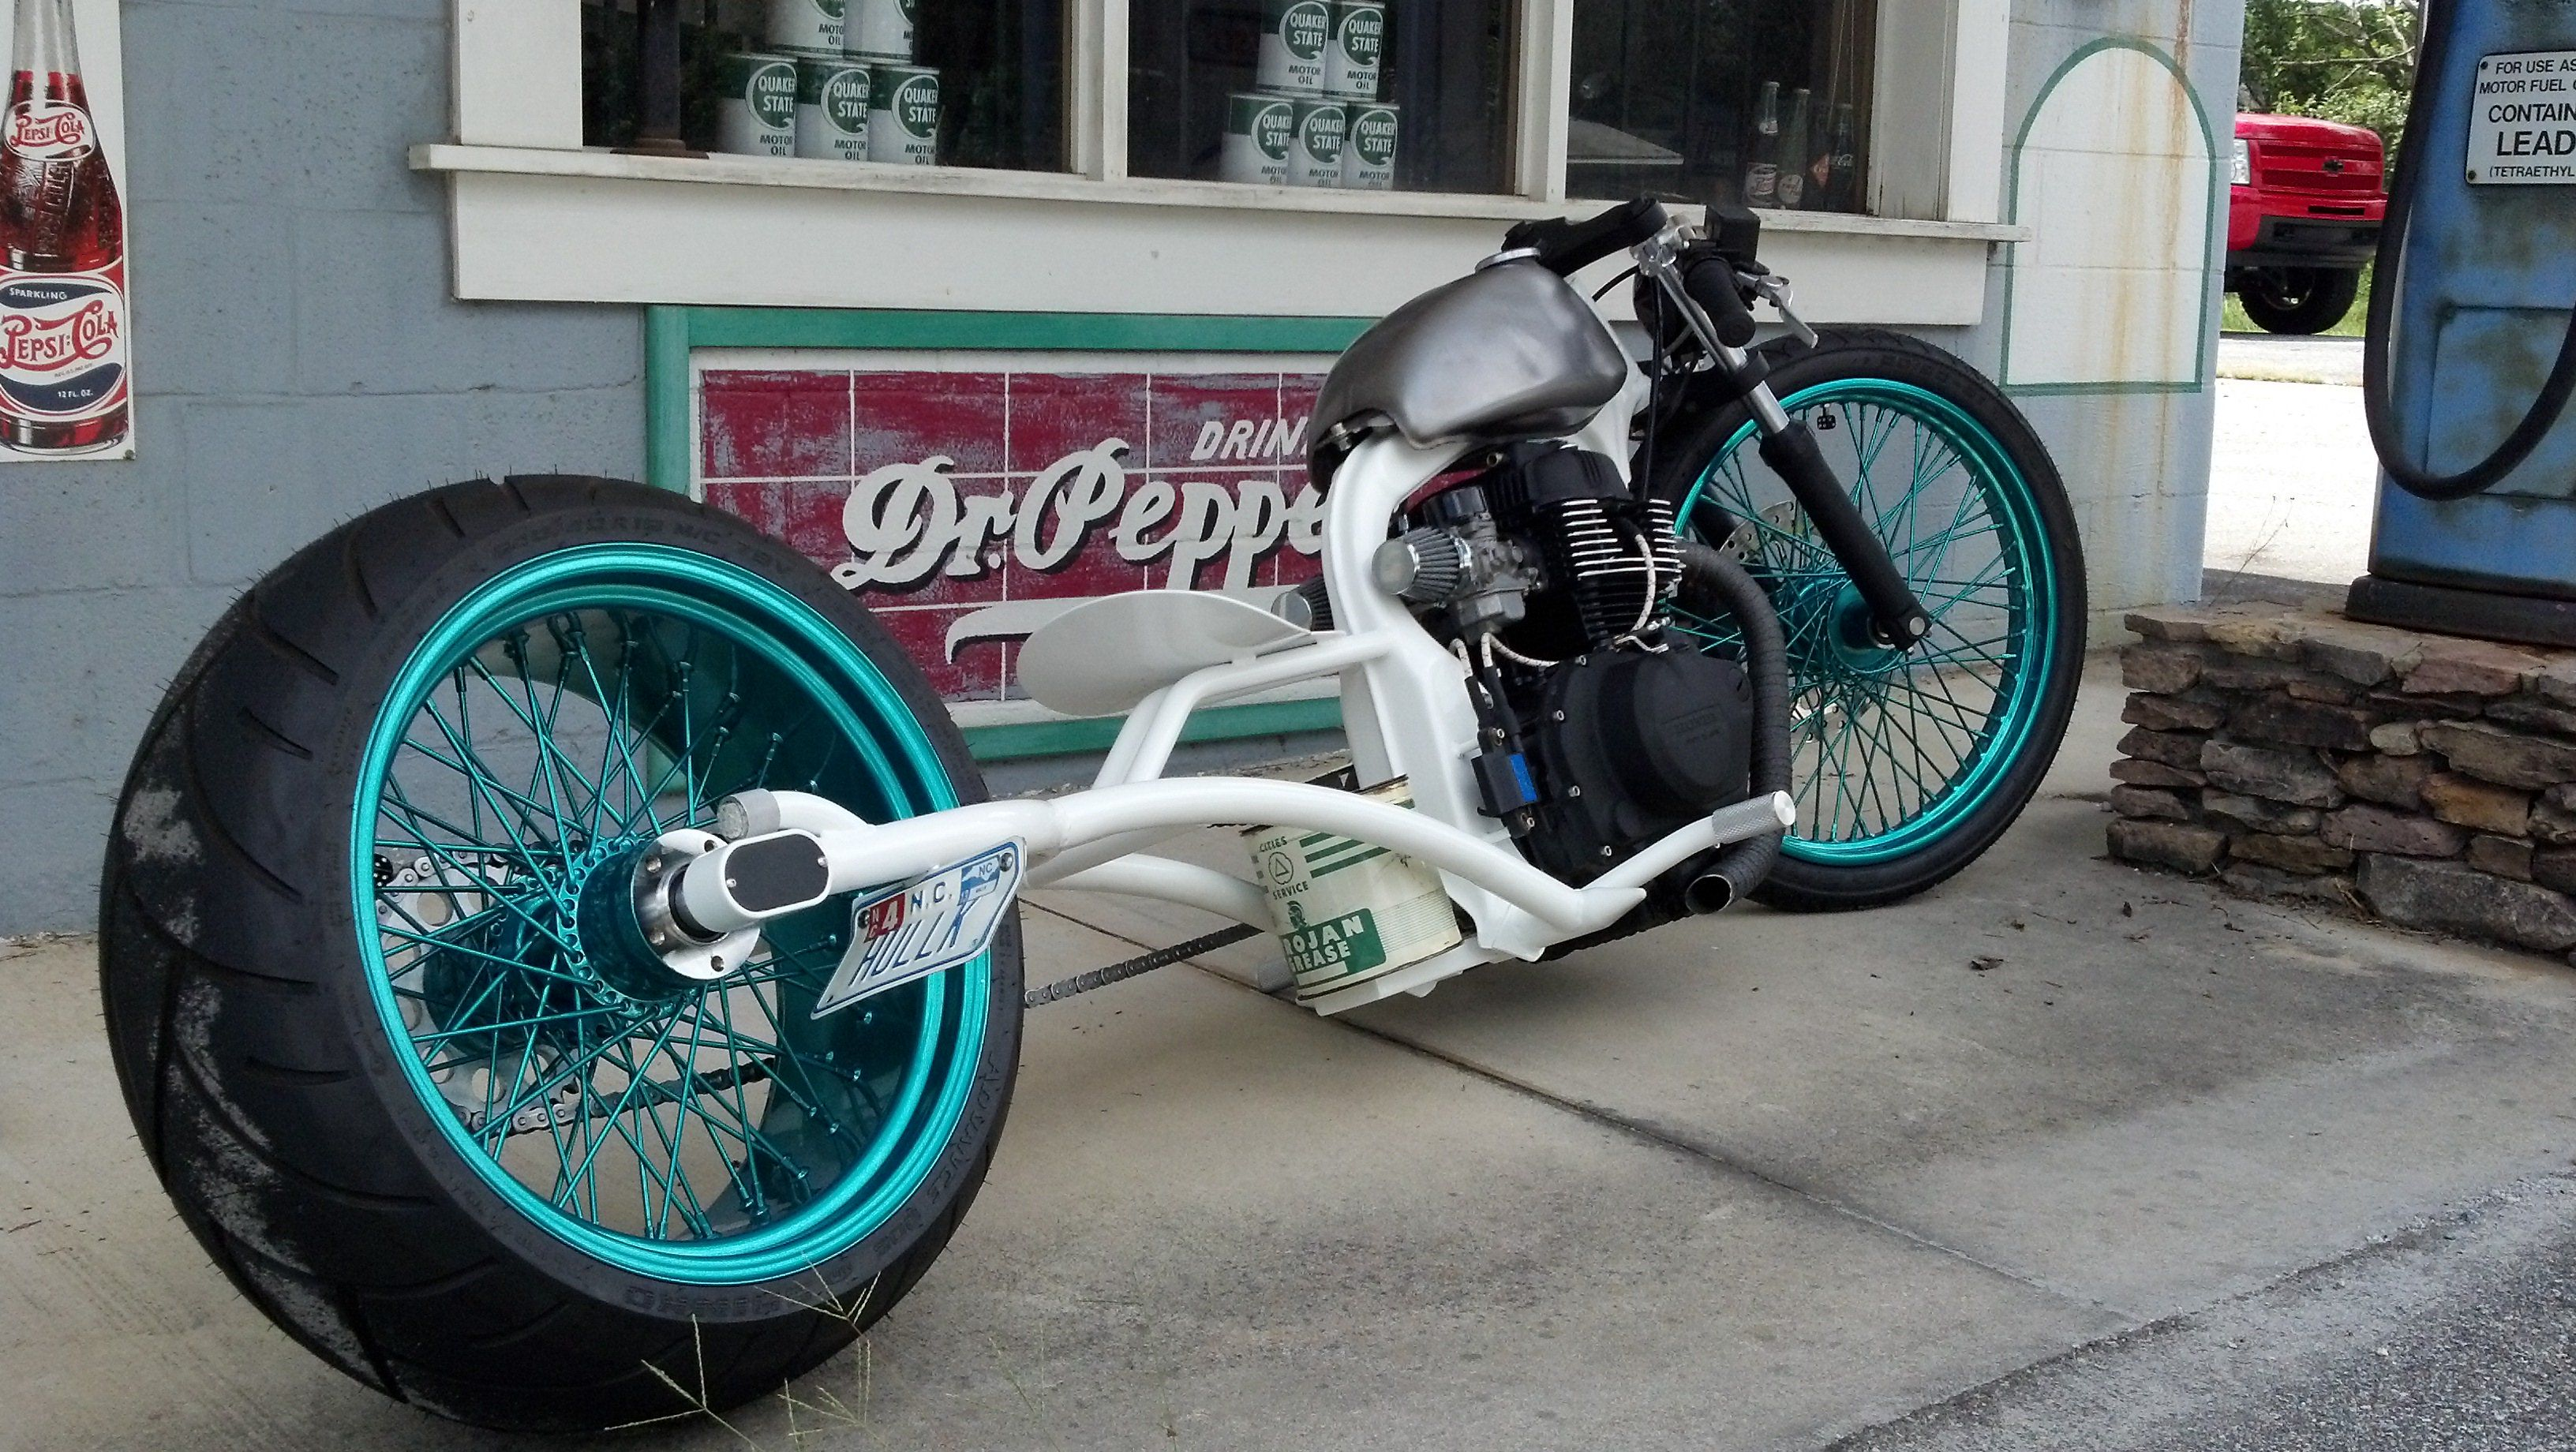 Loose Spokz White Rat Bike Honda Motorcycle Construction